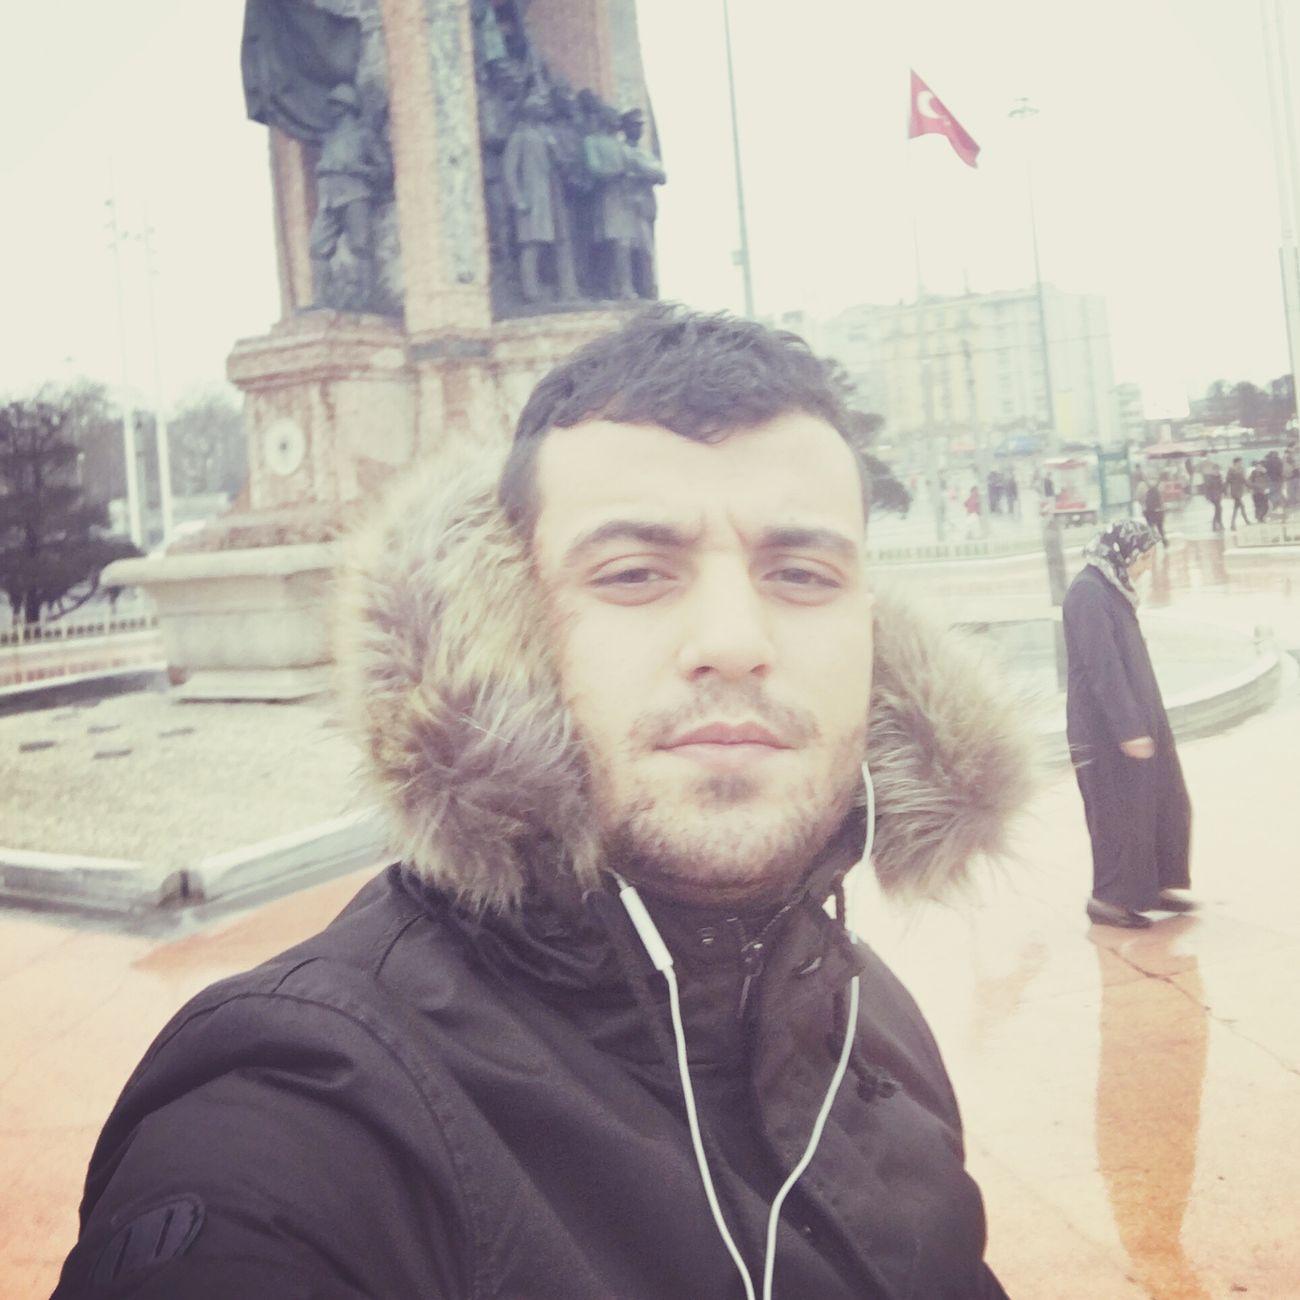 Model Istanbul Taksim Bebek Besiktas Self Portrait Selfie ♥ Selfie ✌ Models Avcılar